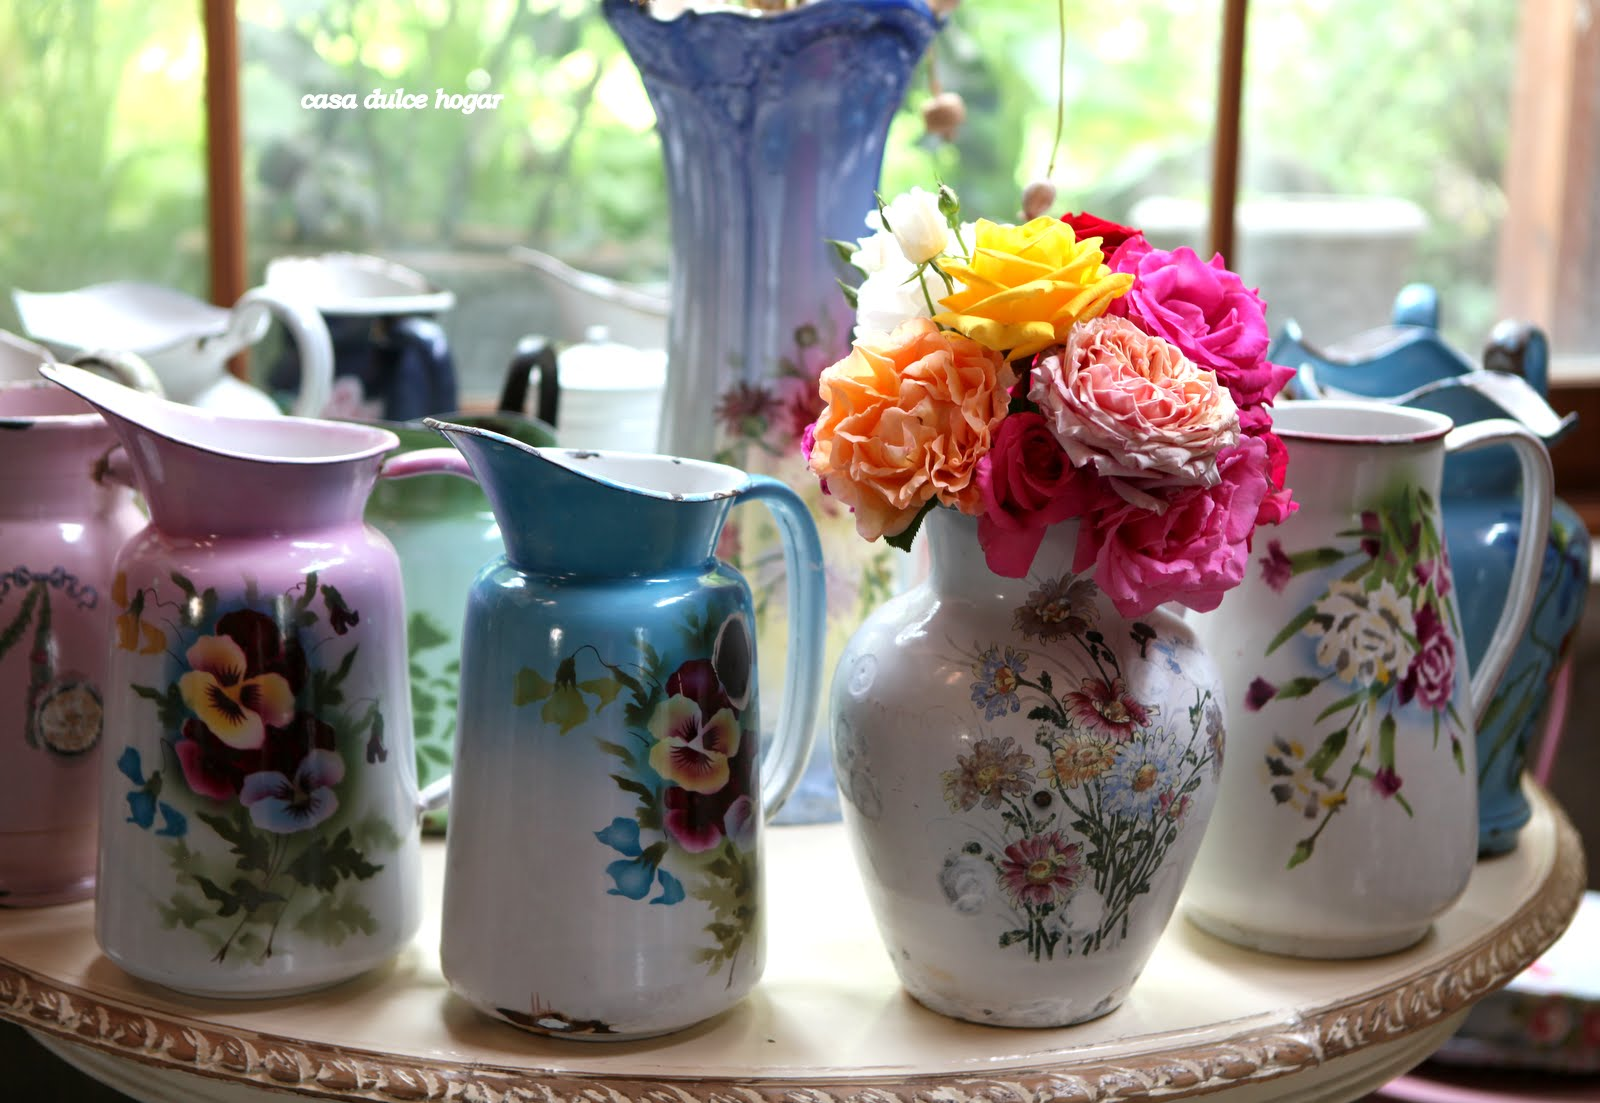 Casa dulce hogar rosas de mi jard n for Casa hogar jardin